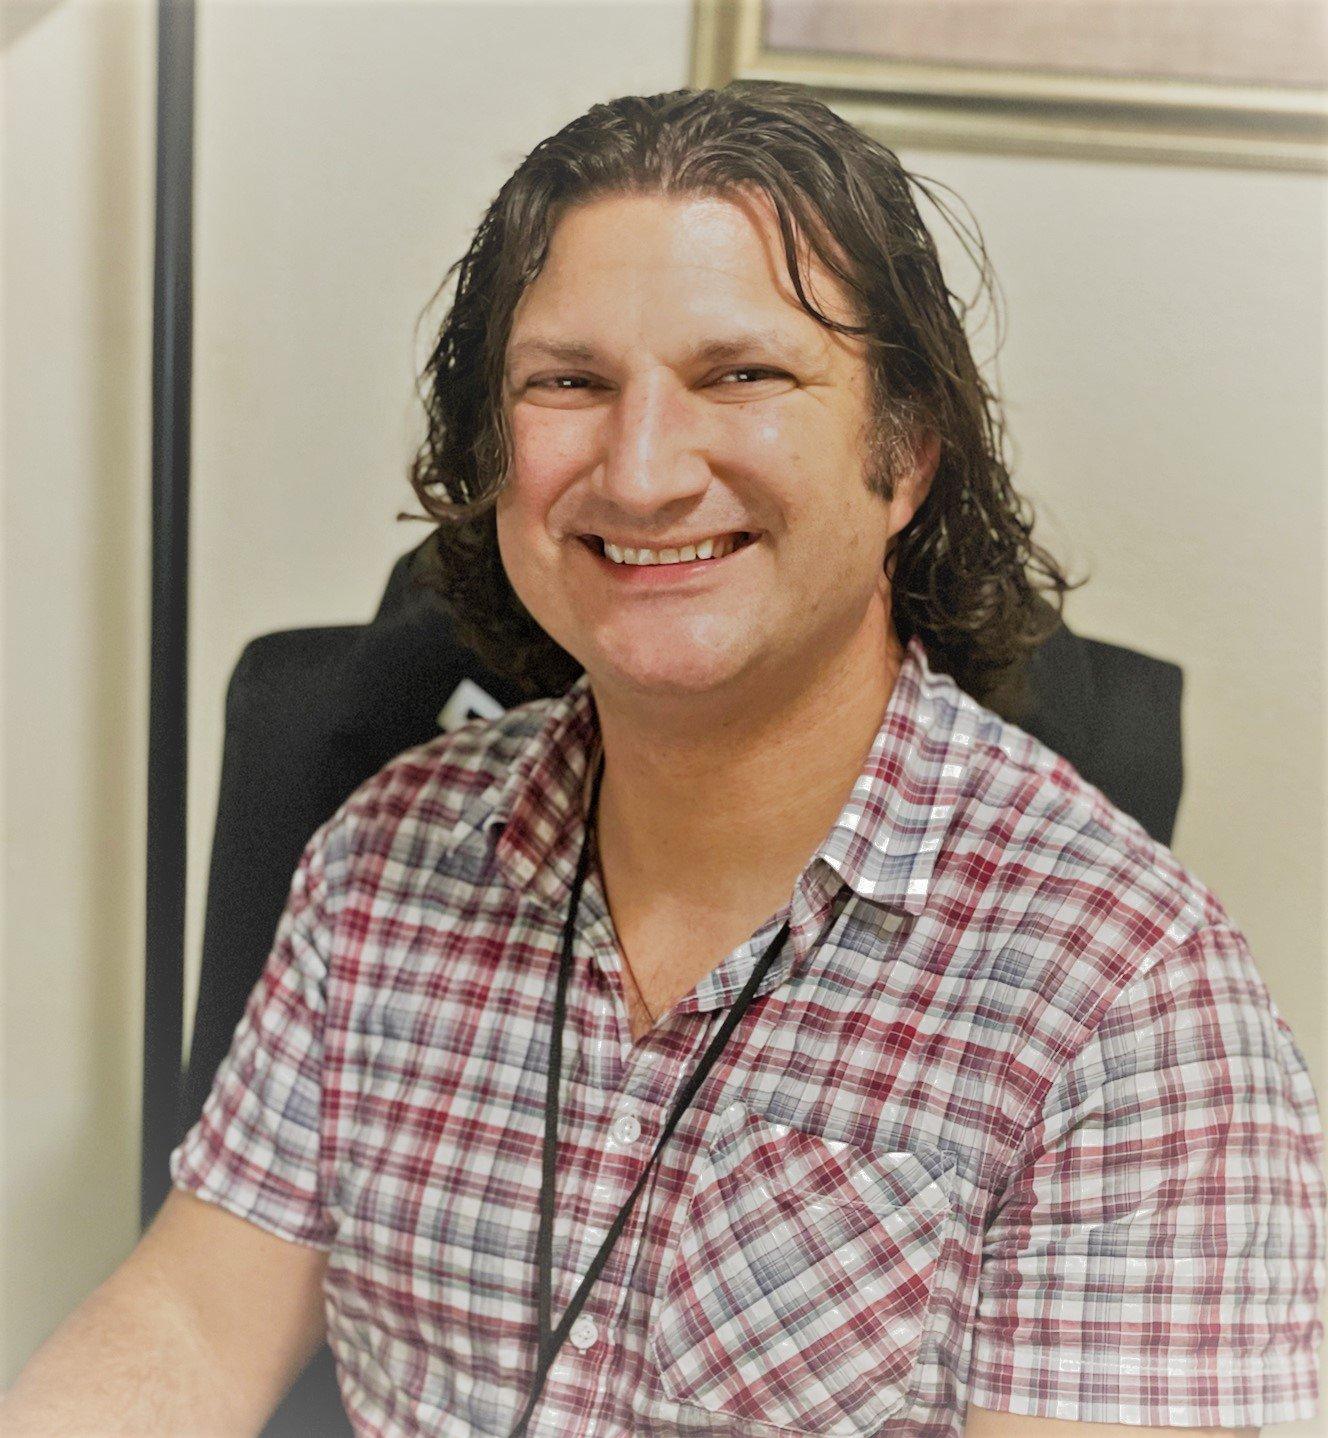 Filippos Markolefas, Counselor